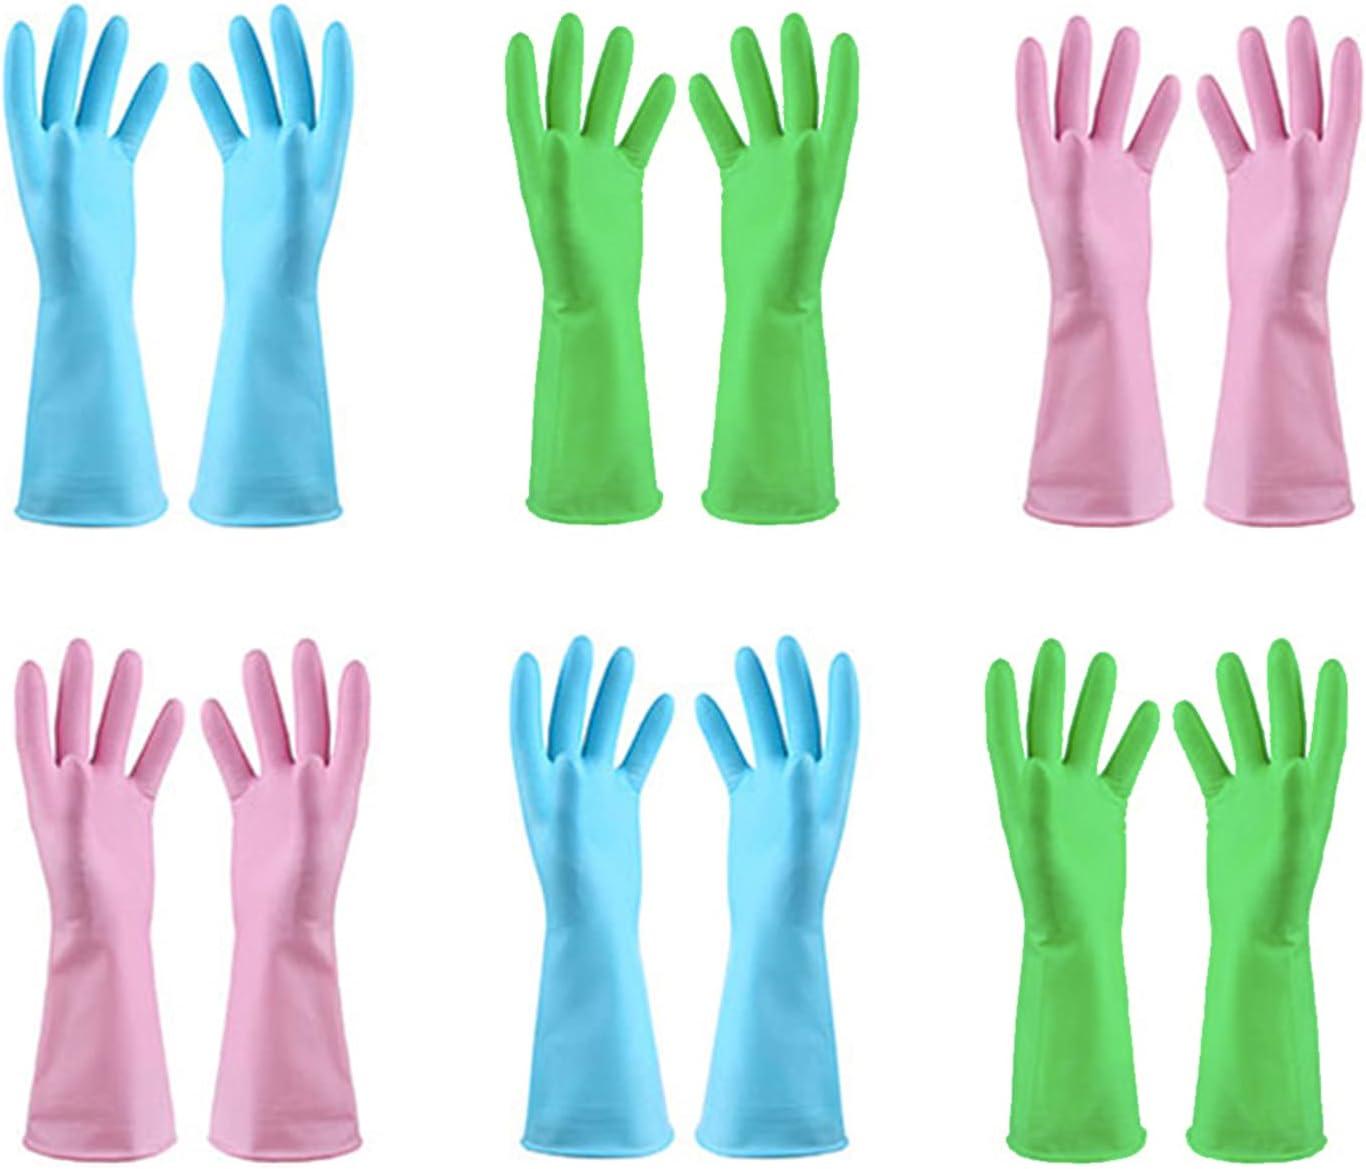 Albuquerque Mall 1 year warranty URSMART Dishwashing Household Gloves -6 Rubber Pairs Kitchen Glo